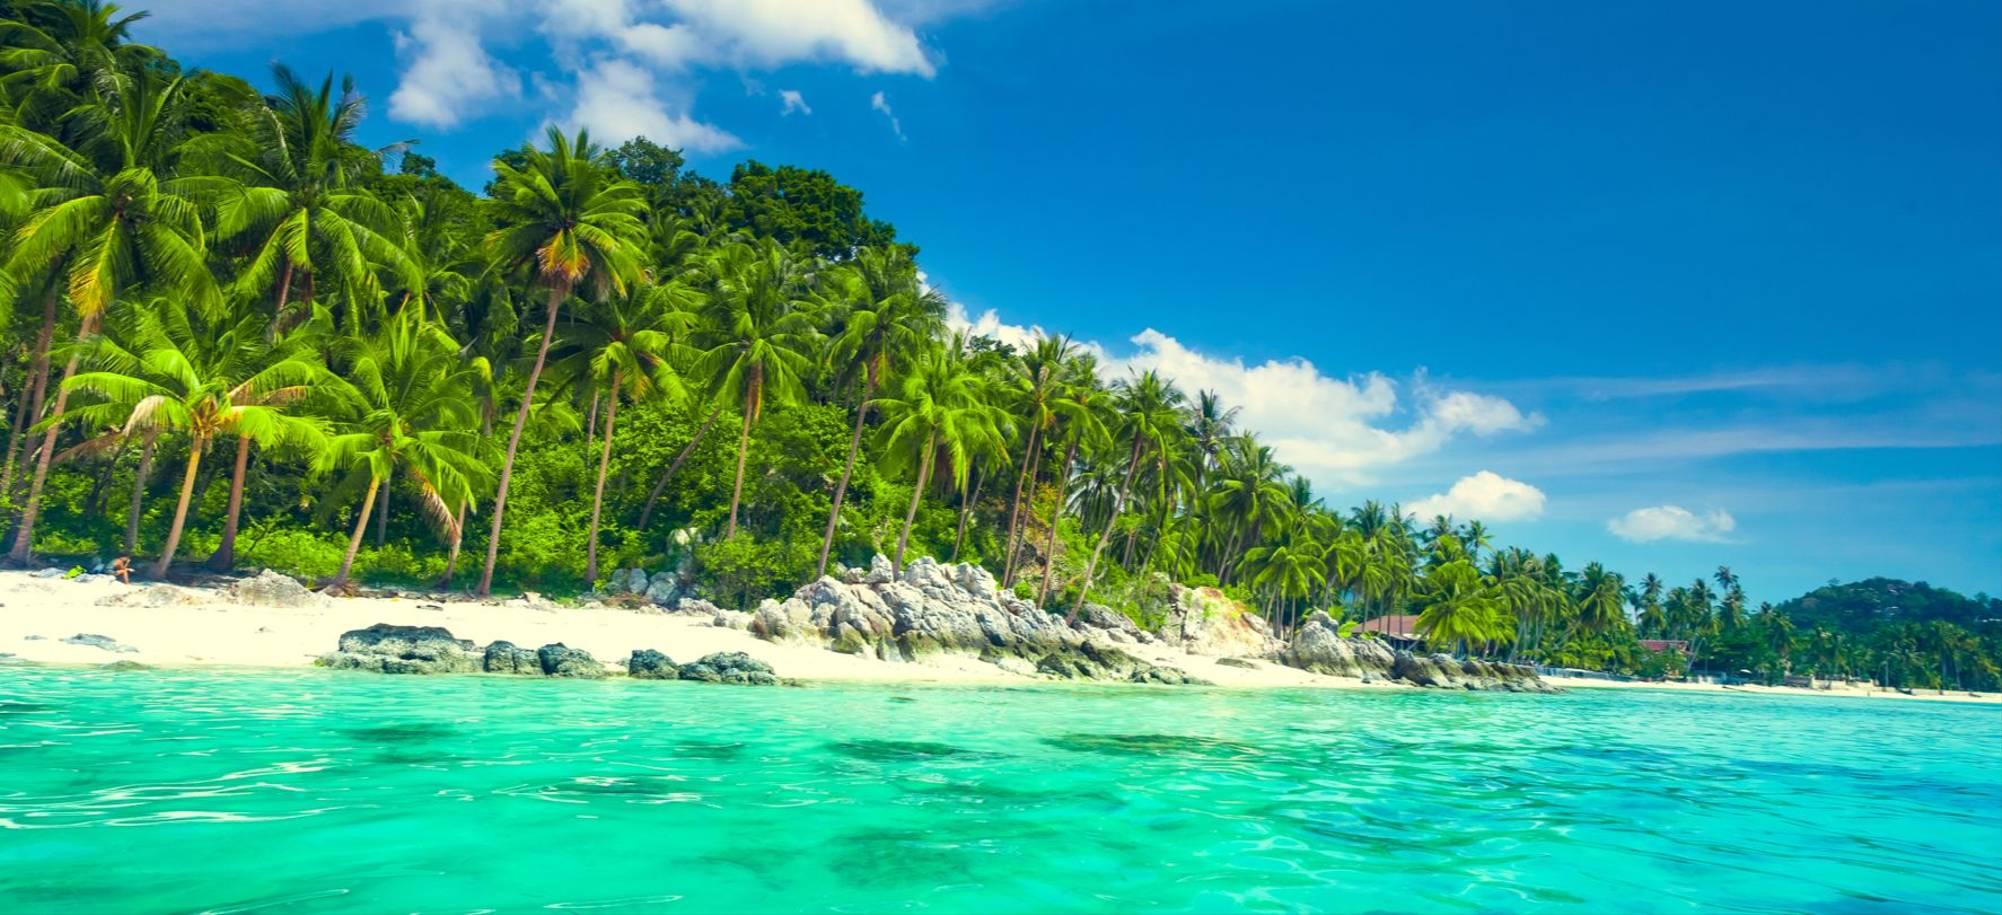 Koh Samui   White Sand Beach   Itinerary Desktop